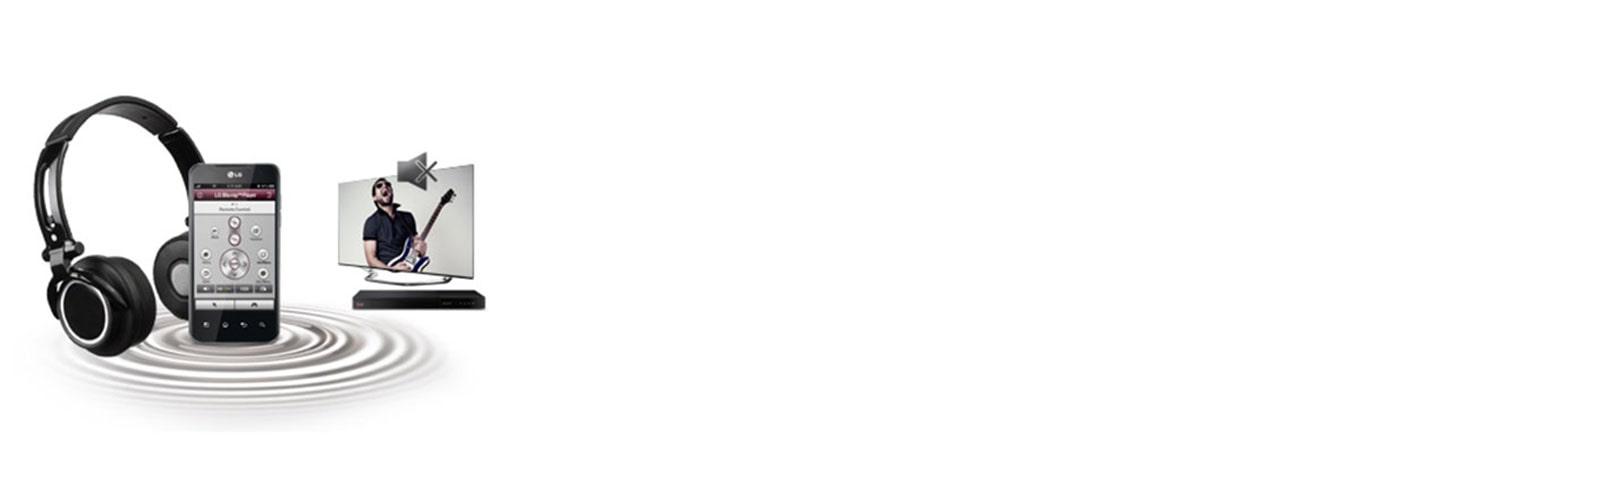 LHB655_Video-feature_Private-Sound-Mode-2_09082017_D_edit